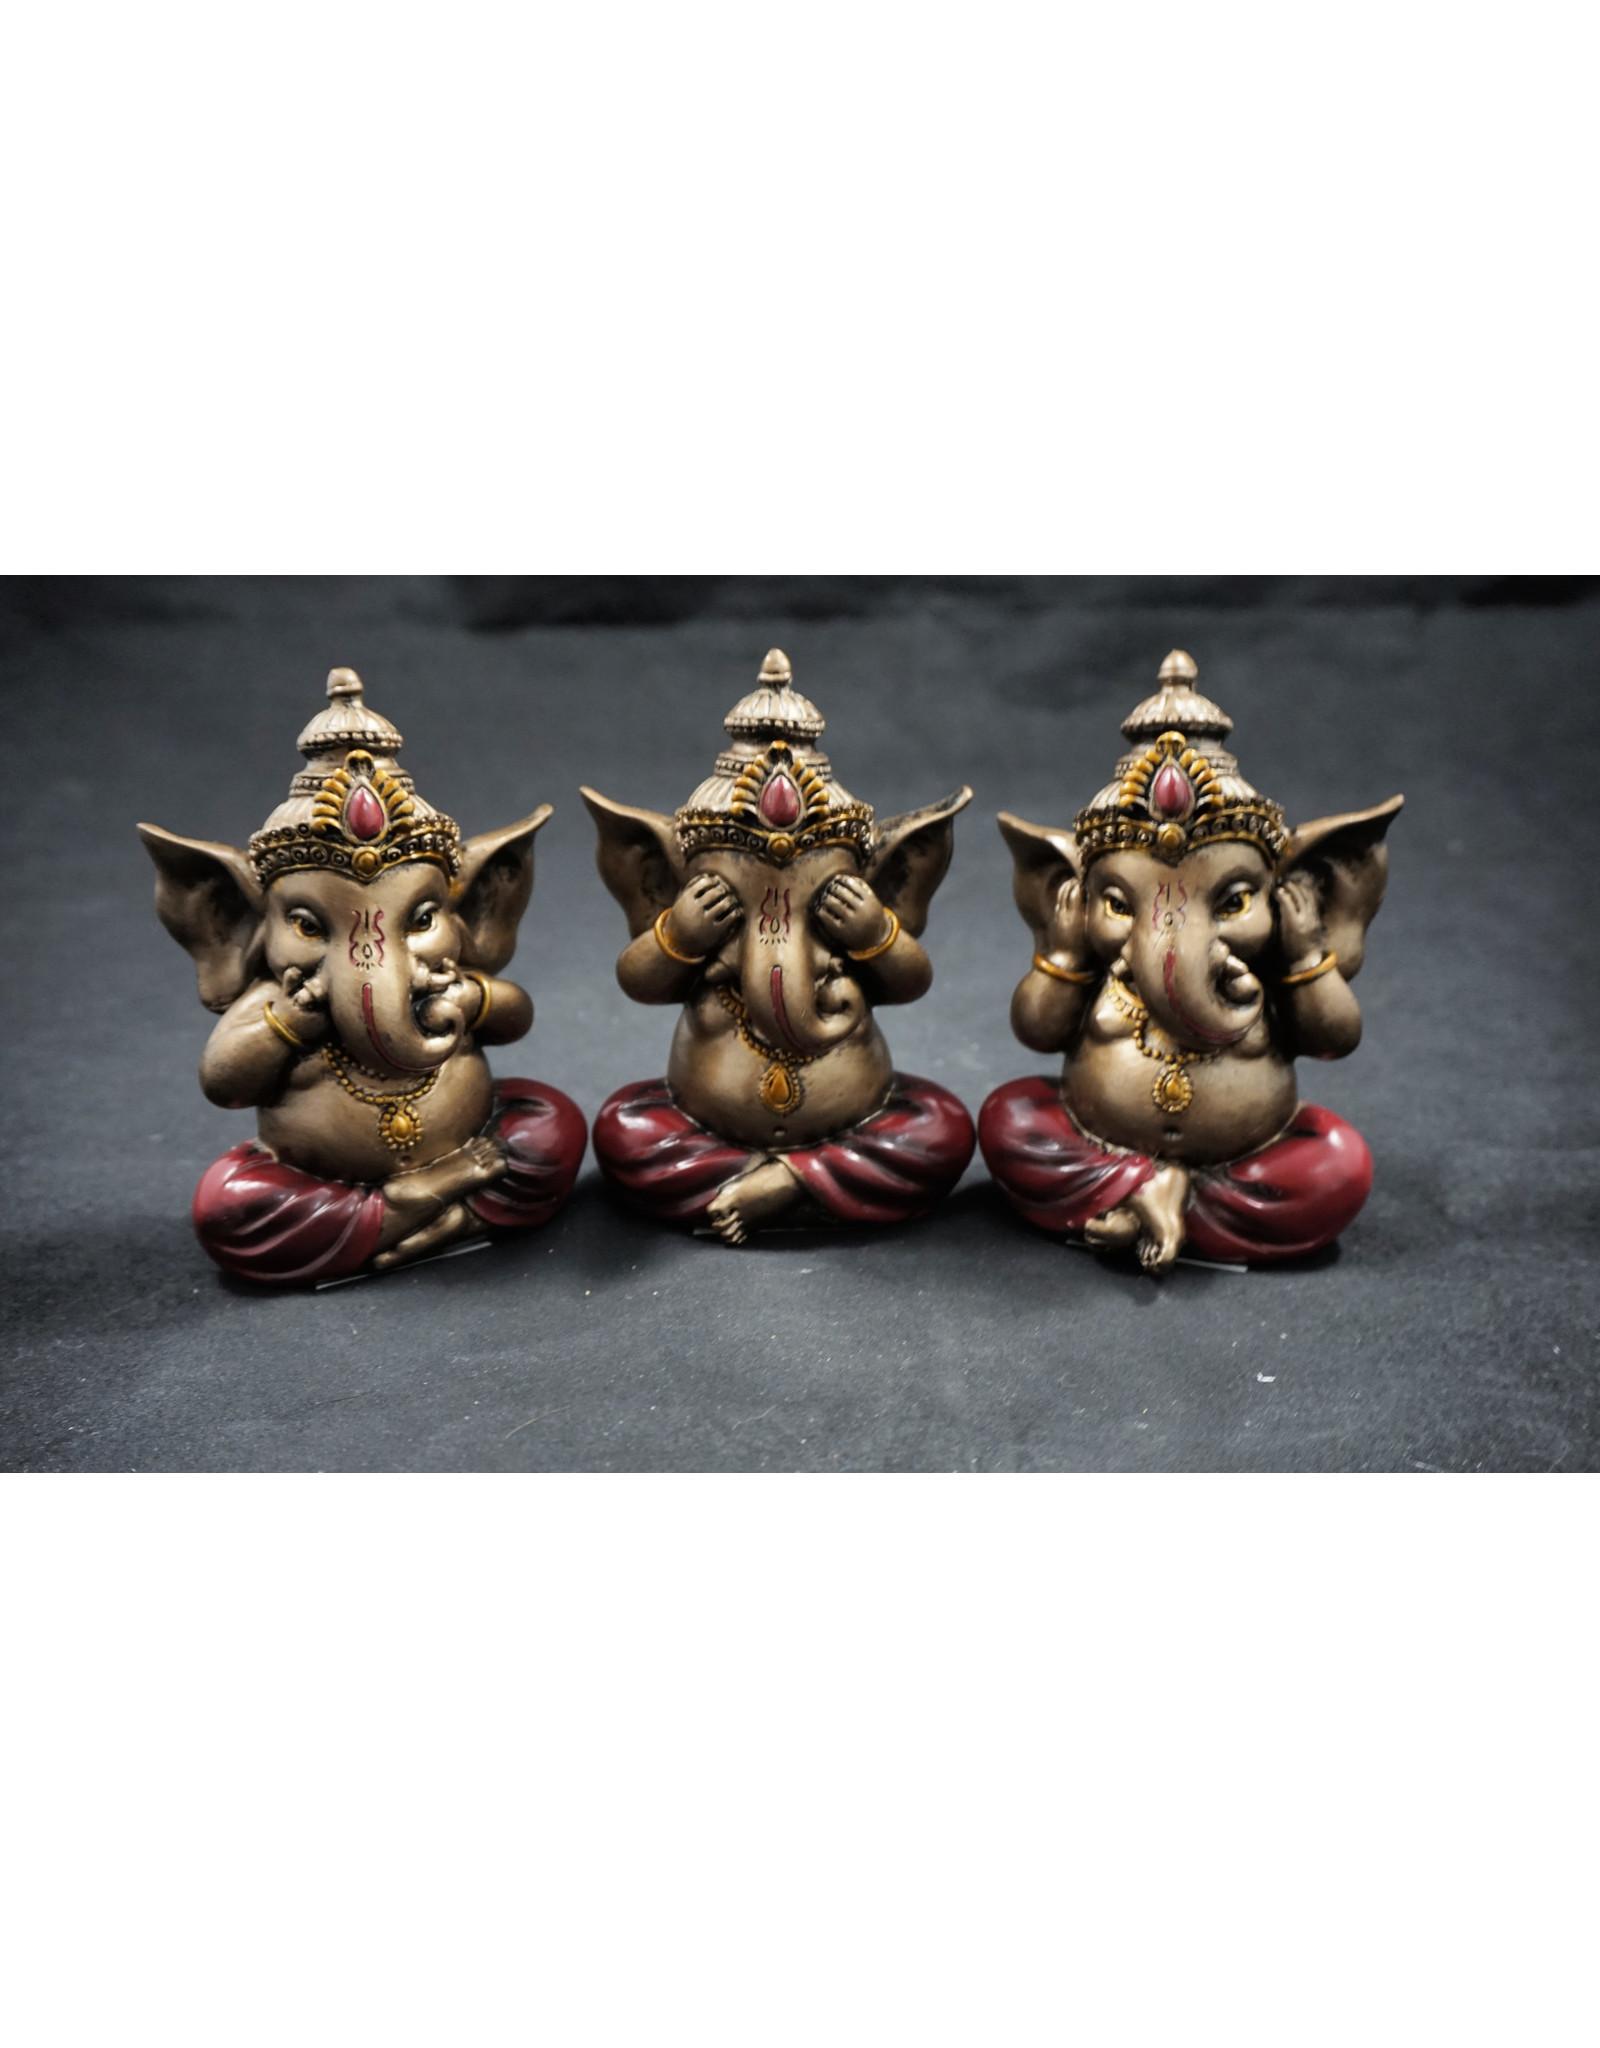 Ganesha Statues - See, Hear, Speak No Evil Set of 3